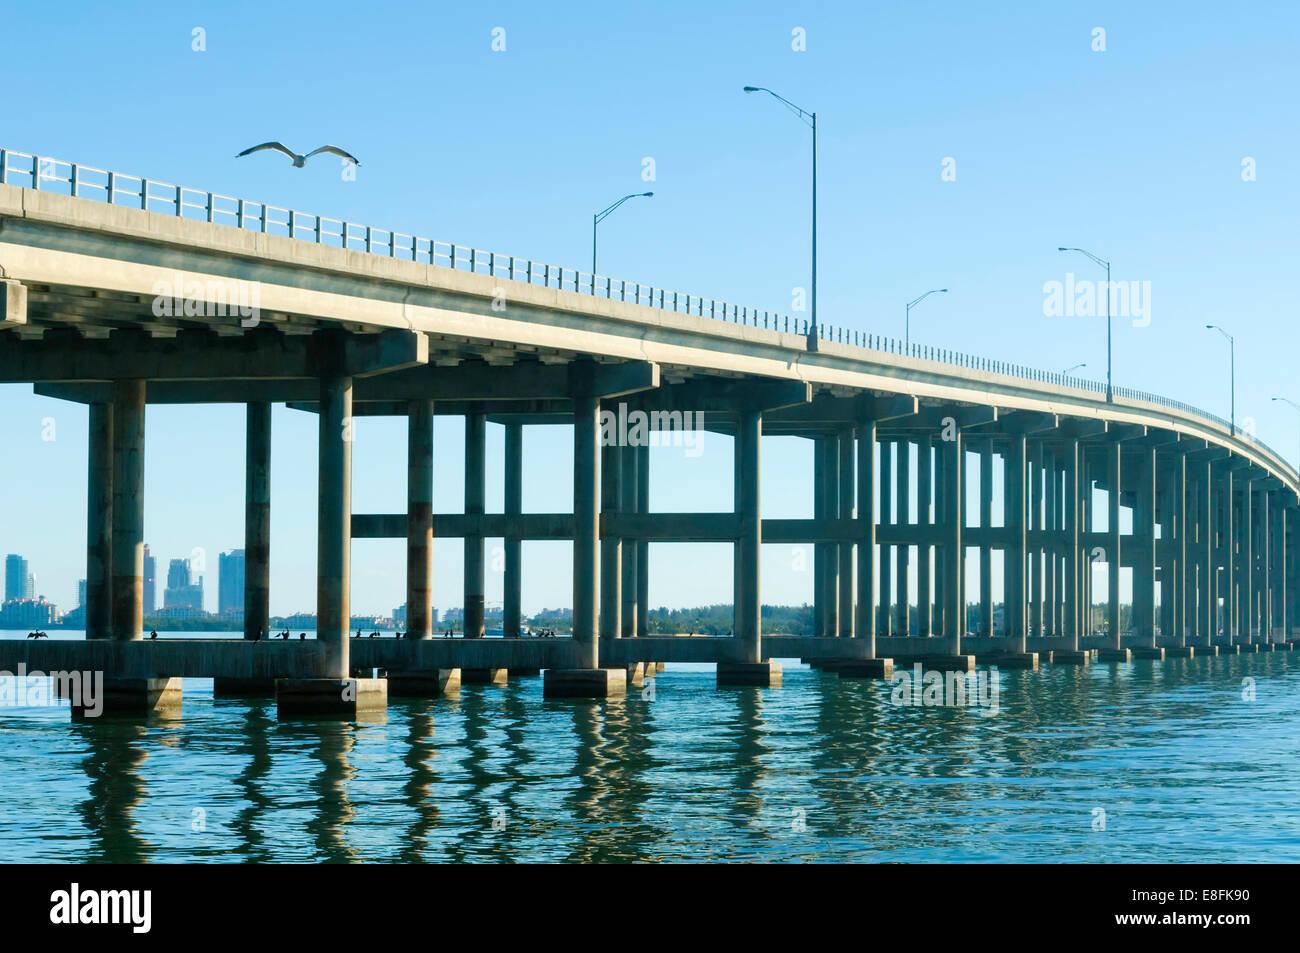 USA, Florida, Biscayne Bay, Seagull flying over long traffic bridge - Stock Image